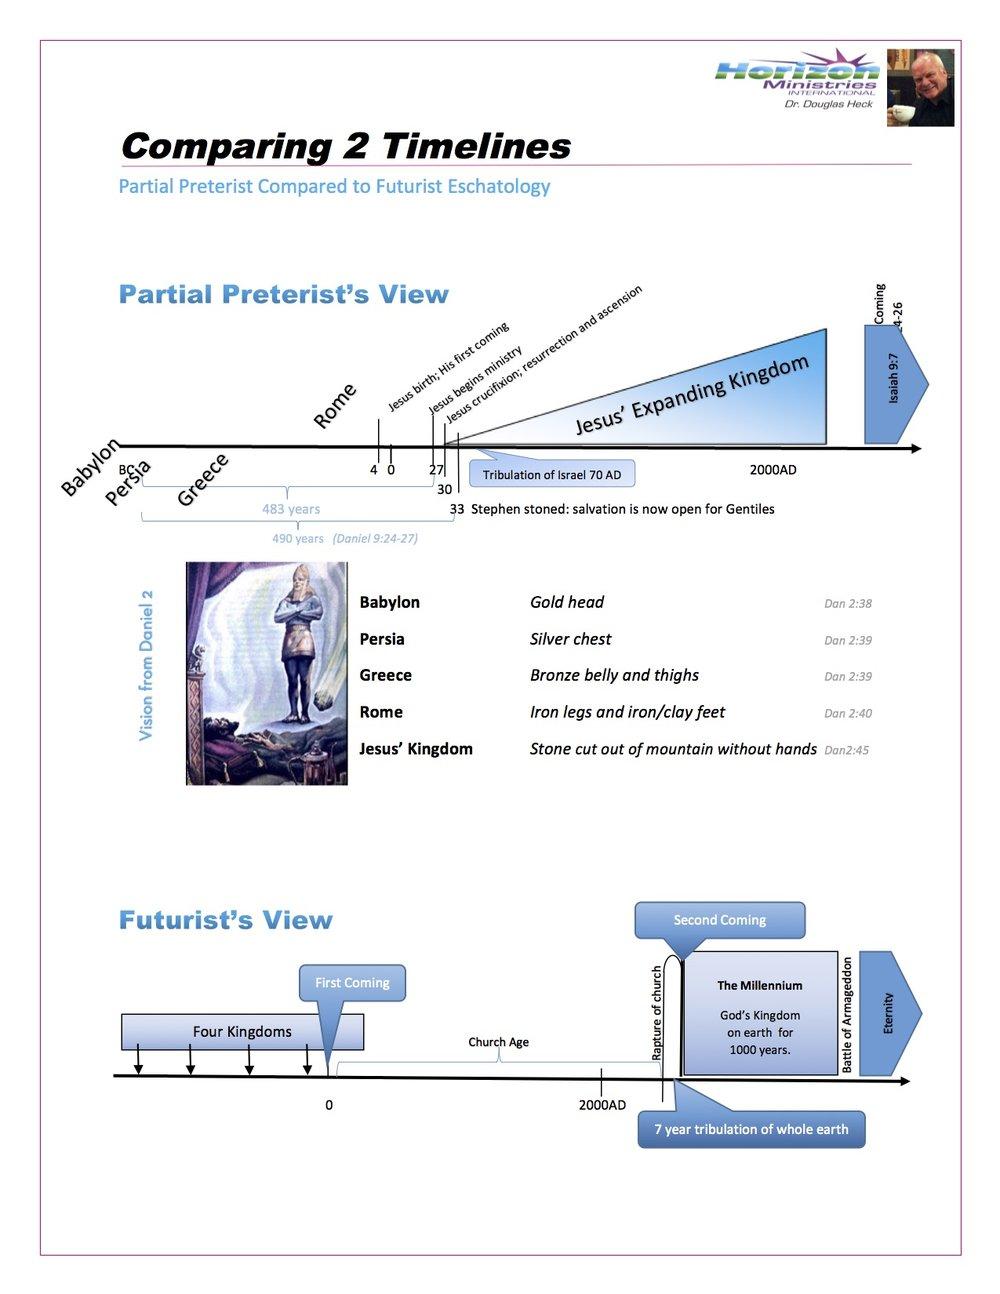 Partial Preterist & Futurist Timelines